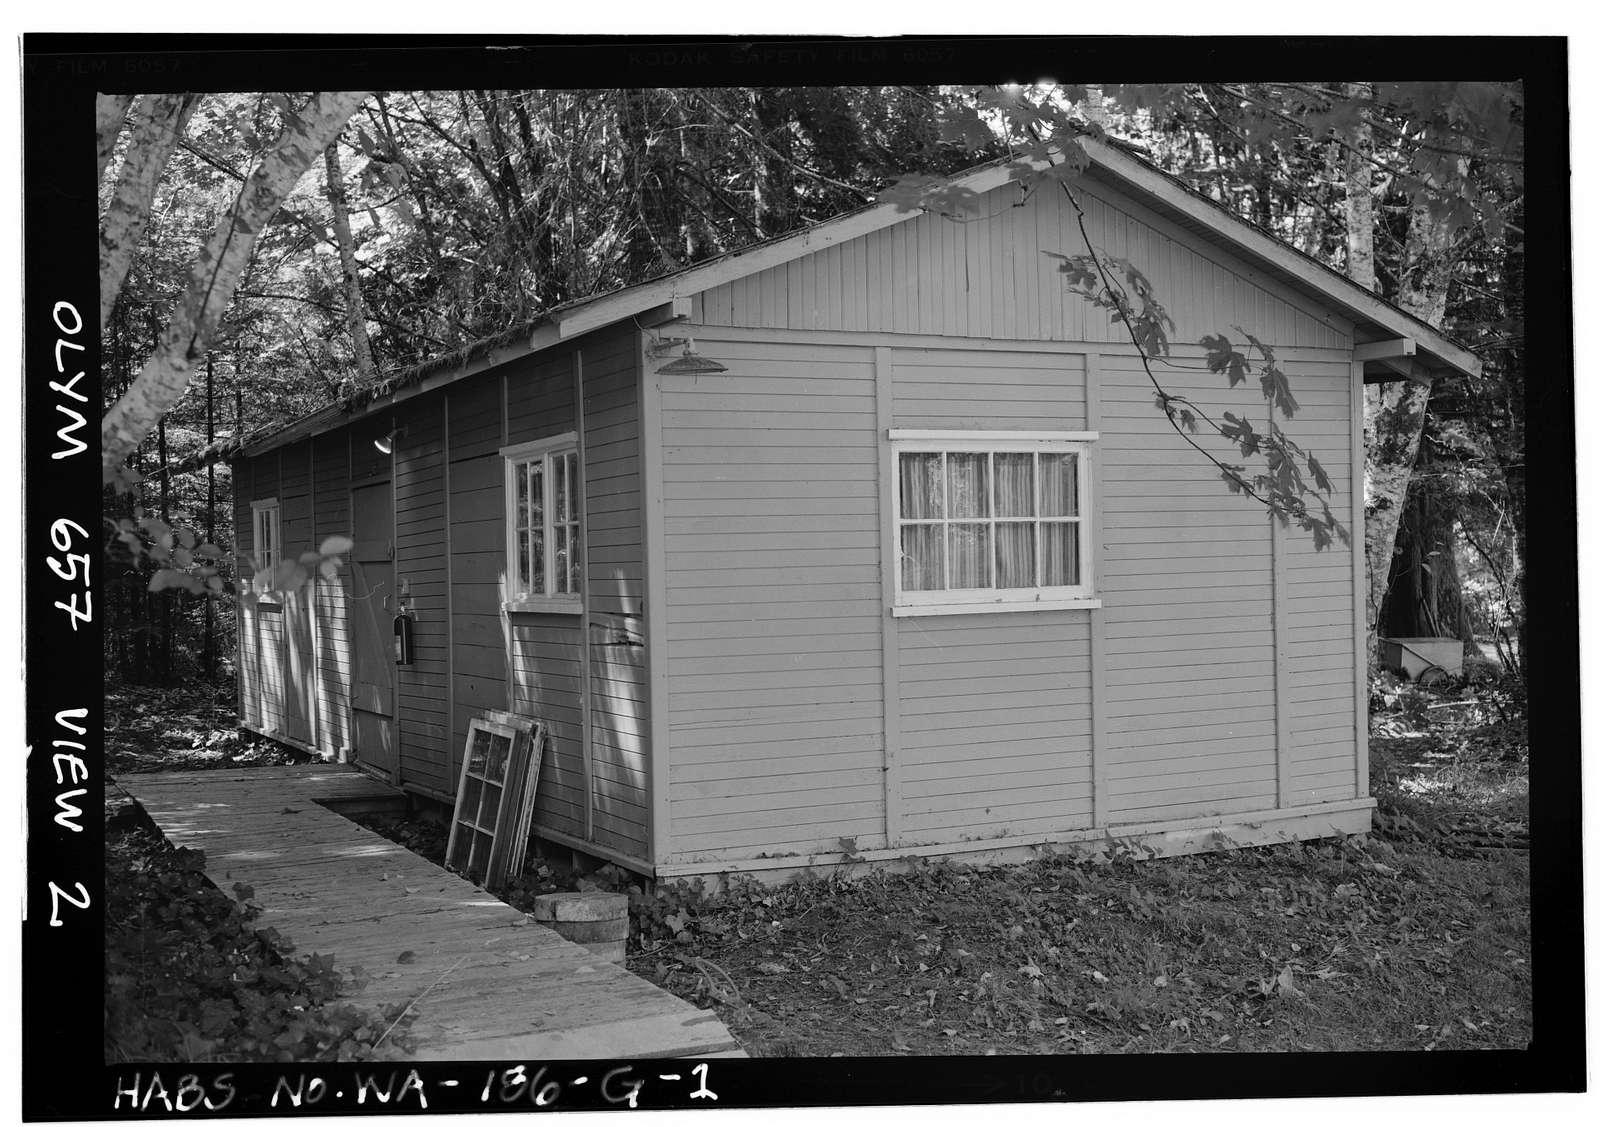 Singer's Lake Crescent Tavern, Employees-Boys Dorm, Barnes Point, Lake Crescent, Port Angeles, Clallam County, WA